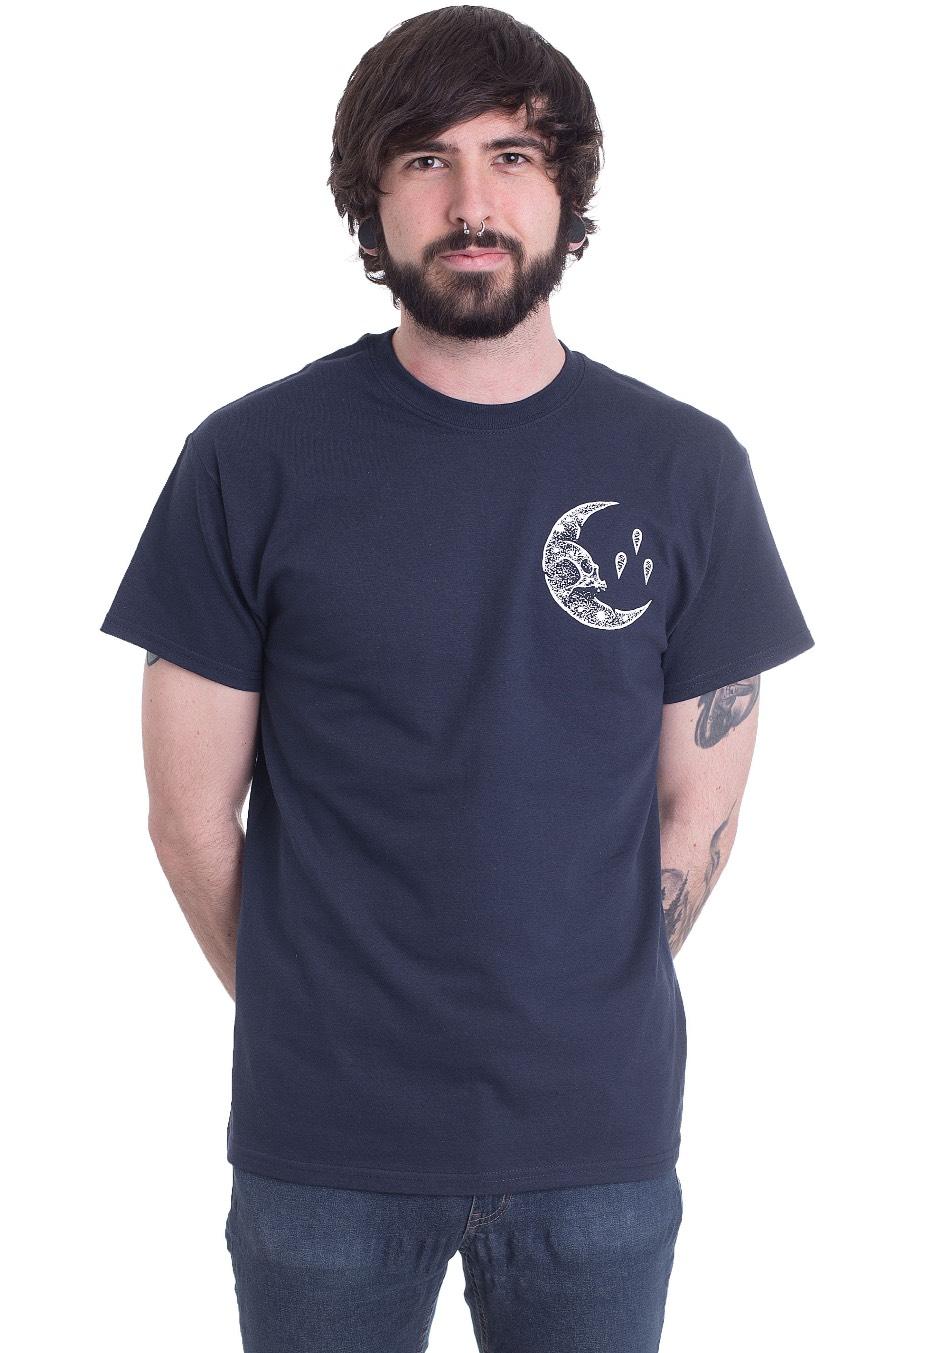 Currents - Moon Navy - T-Shirt